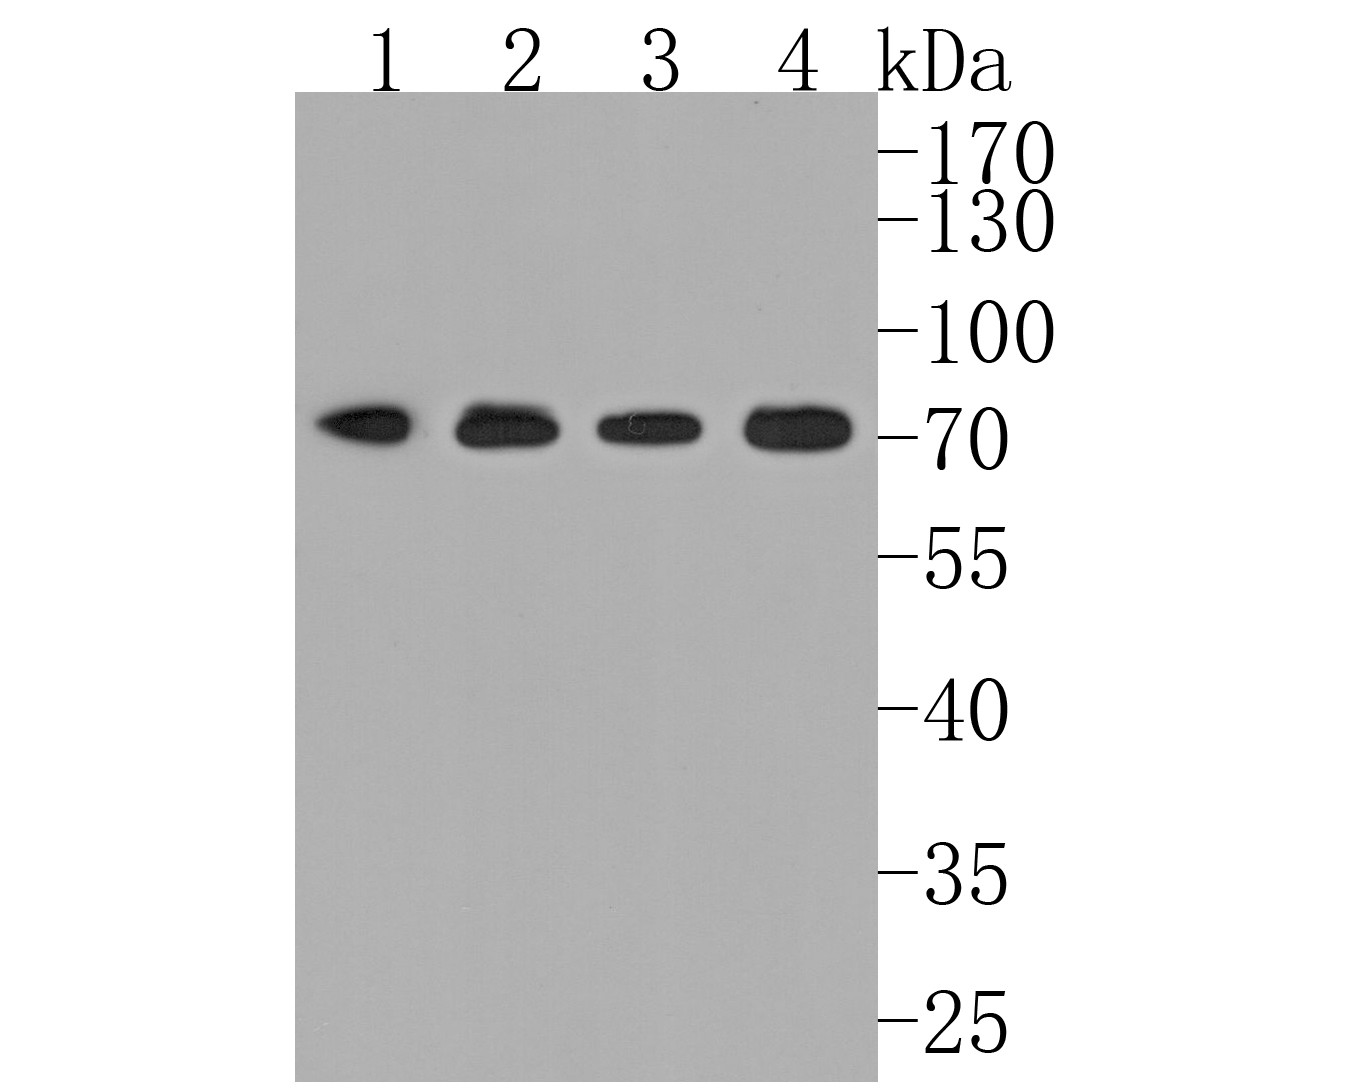 Western blot analysis of BMAL1 on different lysates using anti-BMAL1 antibody at 1/1,000 dilution.<br />  Positive control: <br />   Lane 1: NIH/3T3 <br />   Lane 2: Rat brain <br />   Lane 3: Mouse spleen <br />   Lane 4: Hela